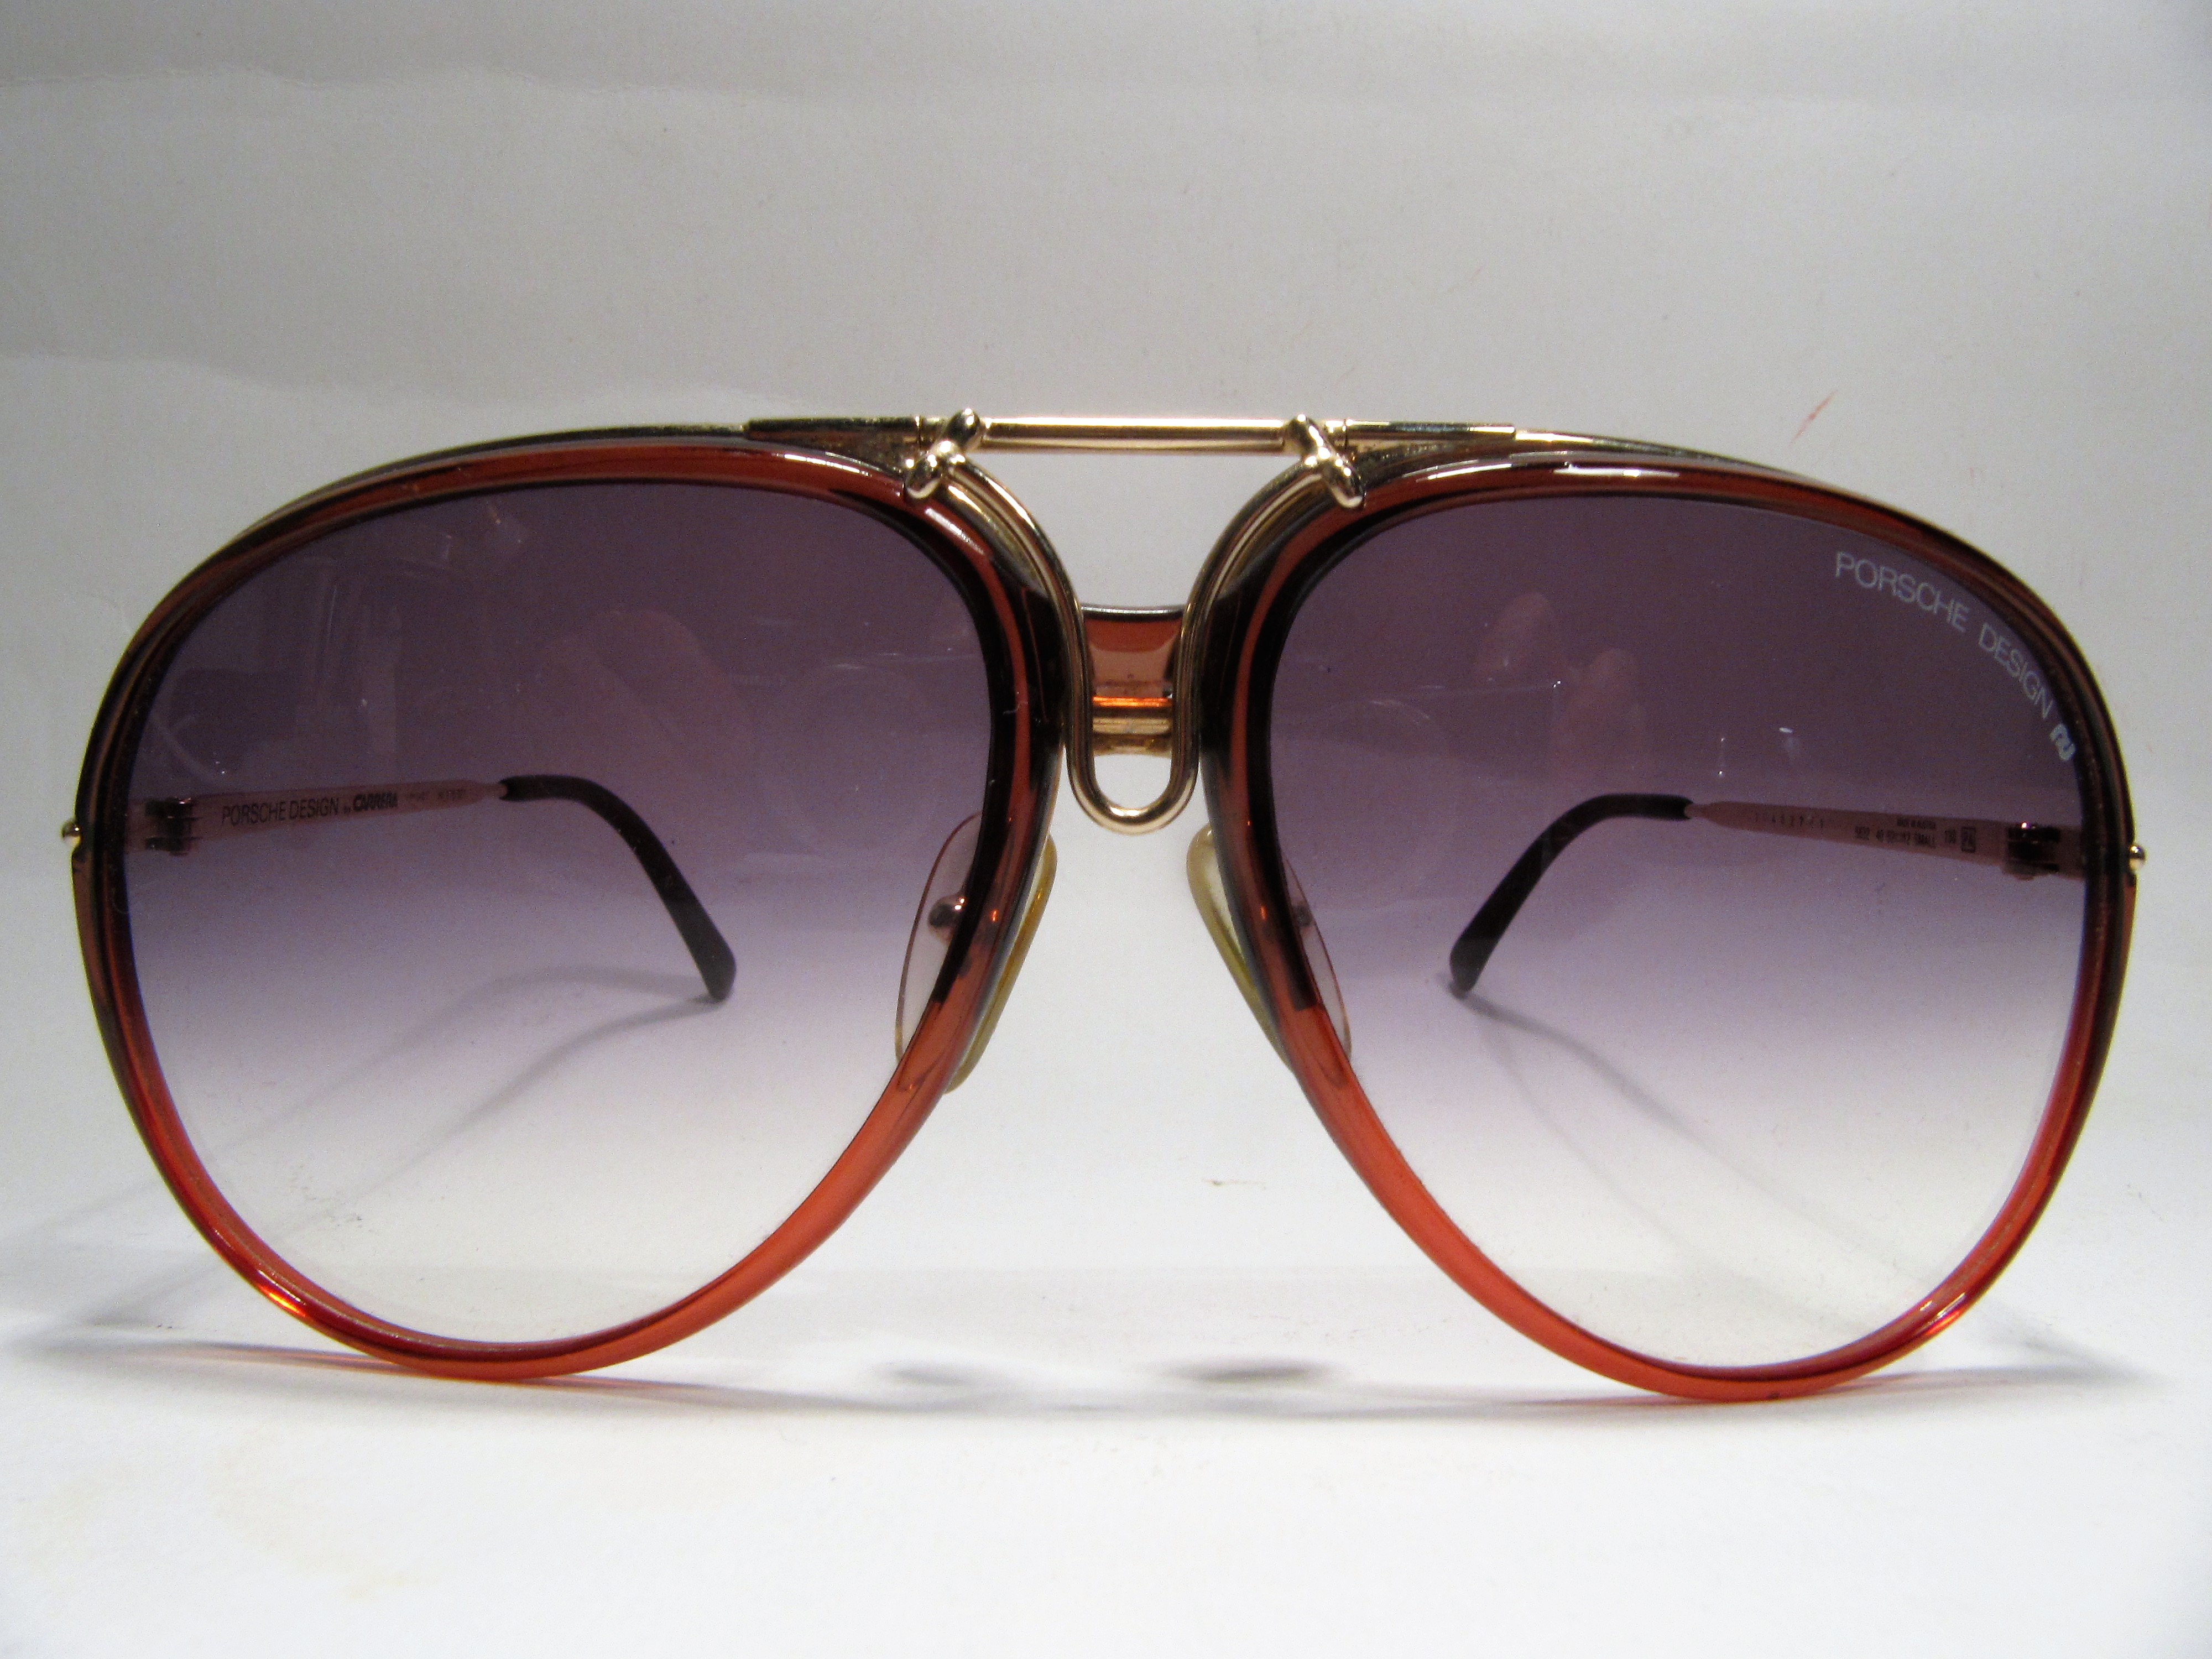 PORSCHE Design by Carrera 5632 1980s vintage sunglasses made in Austria